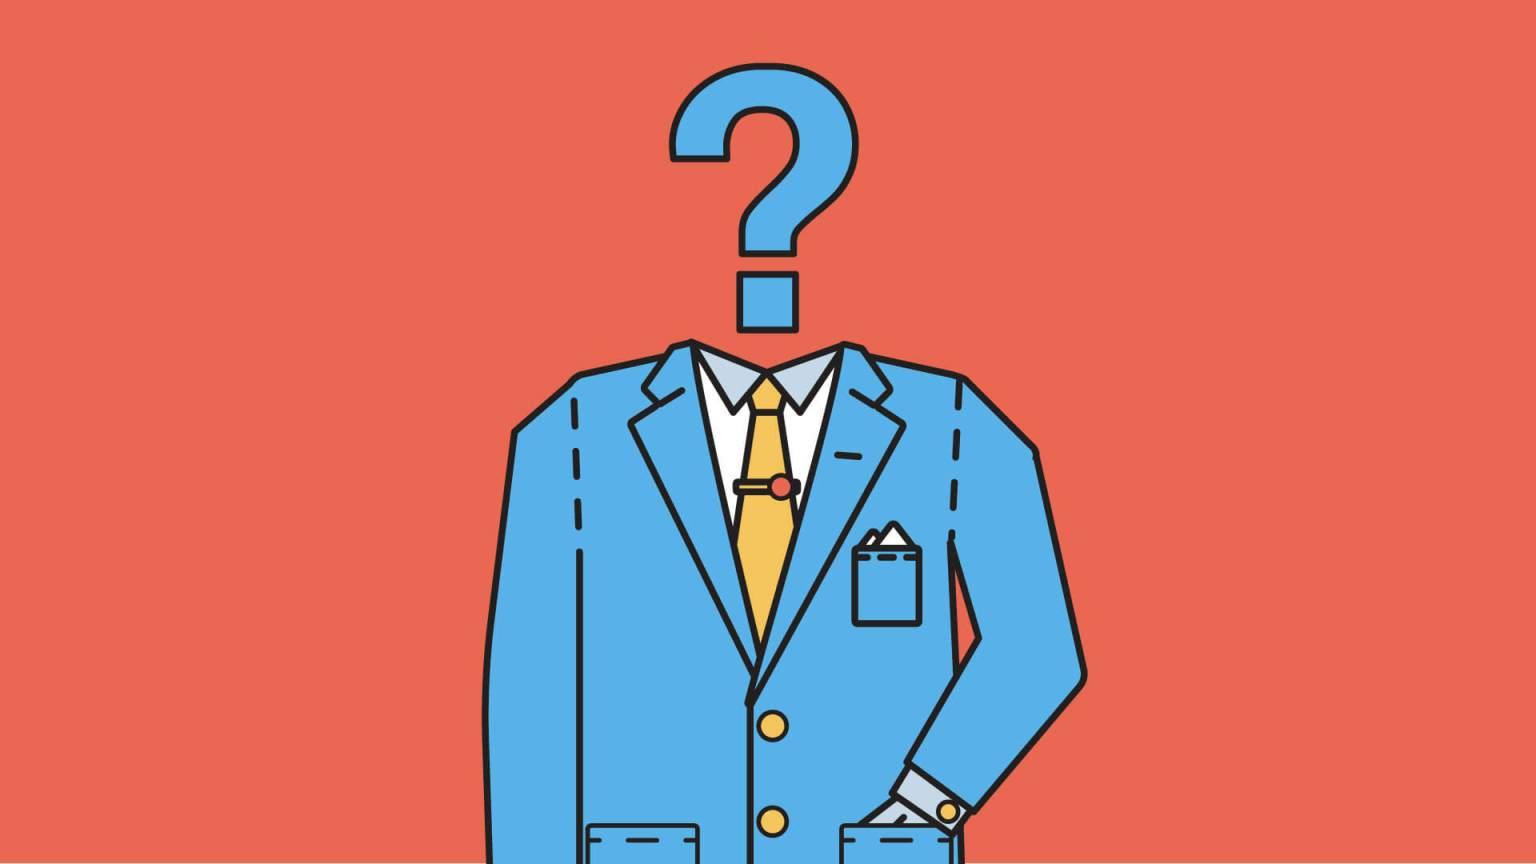 Copertina customer, target, utente o persona?